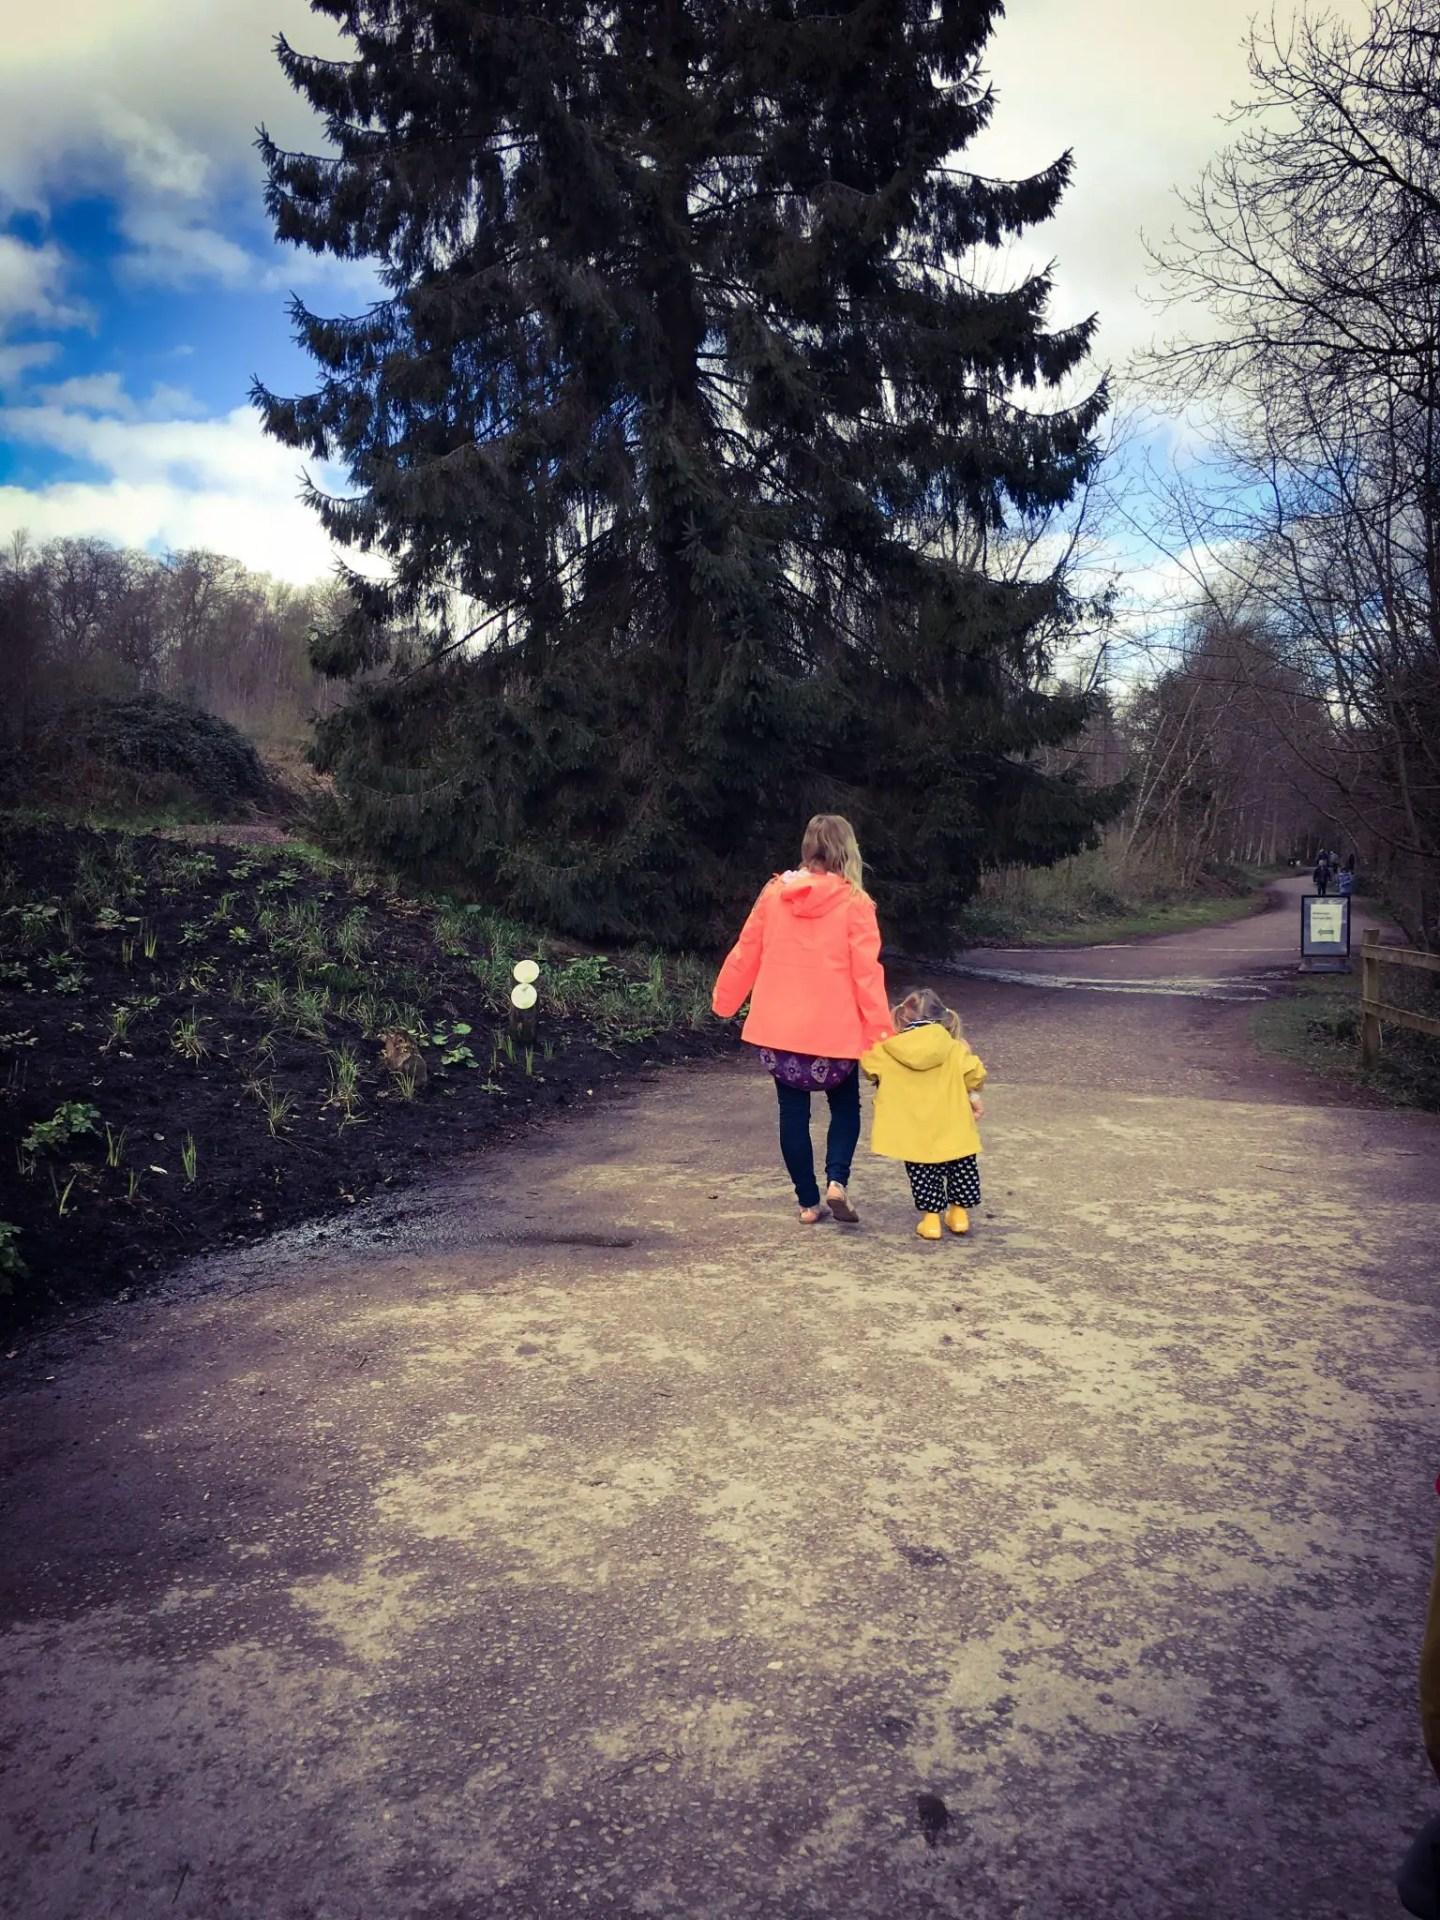 Trentham Gardens Staffordshire